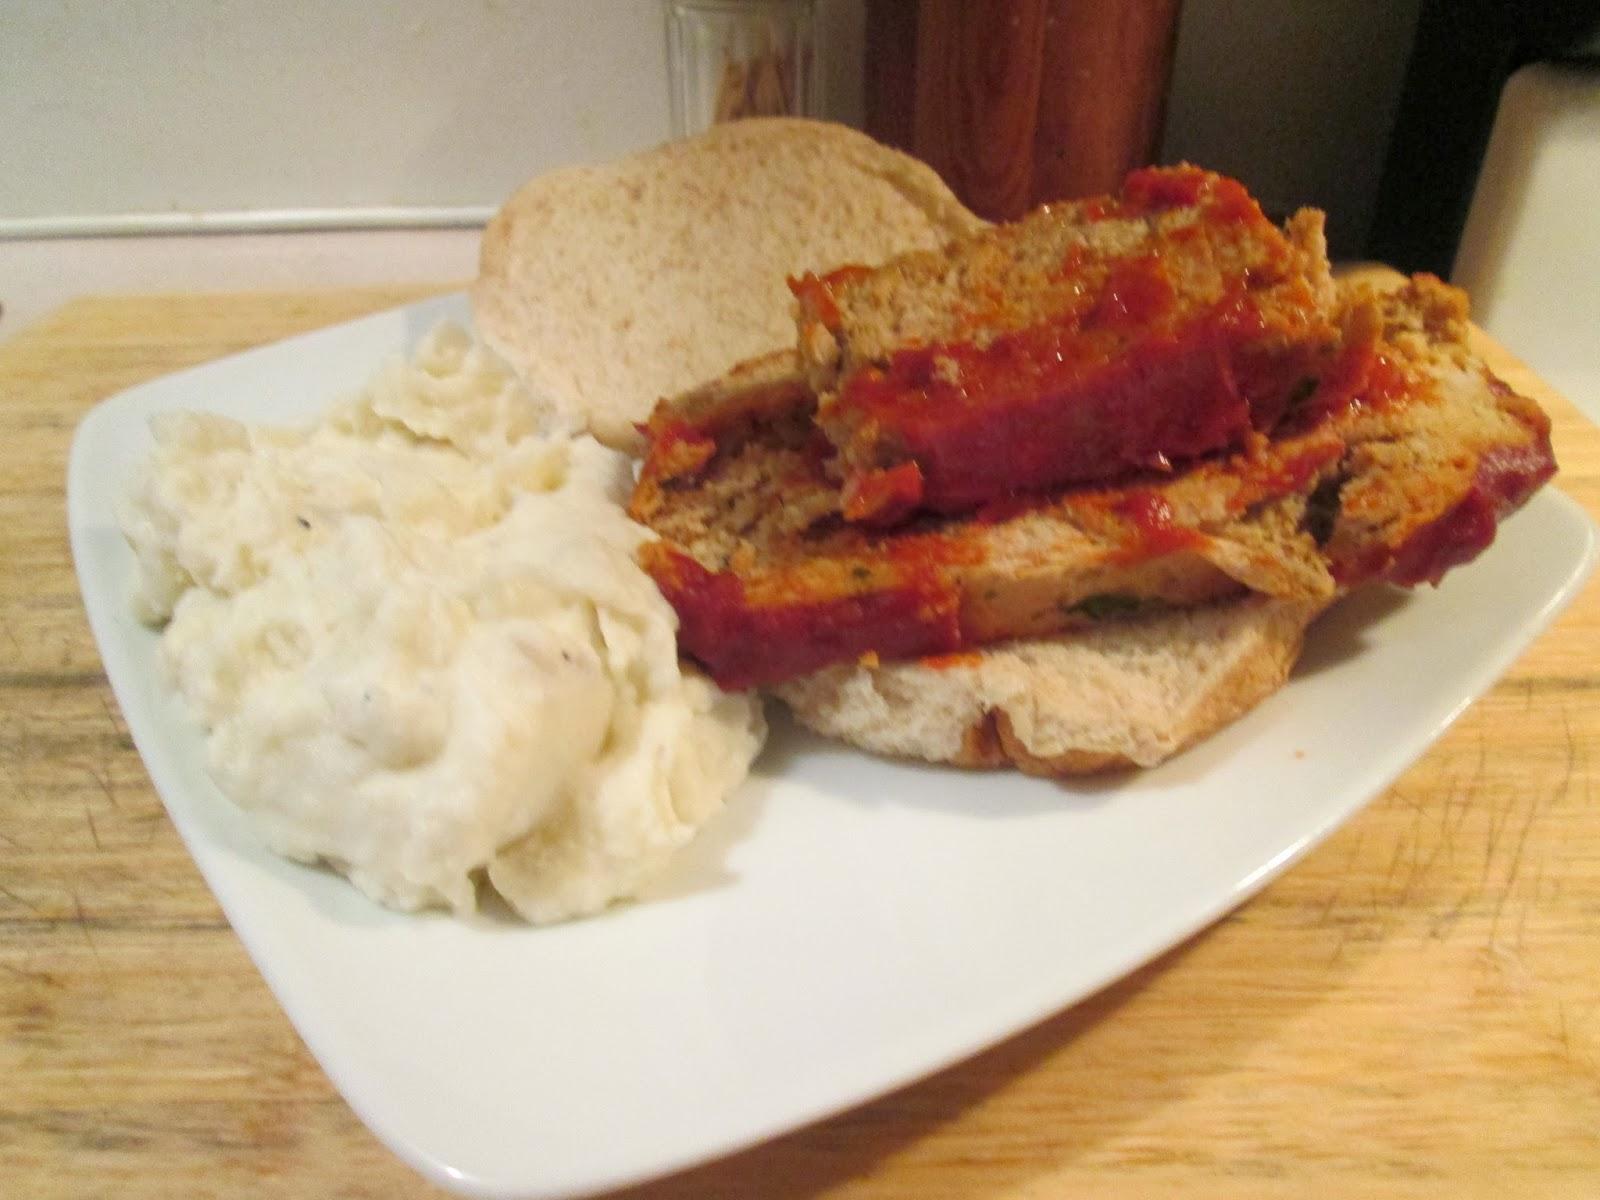 Turkey Meatloaf Sandwich i Love This Turkey Meatloaf